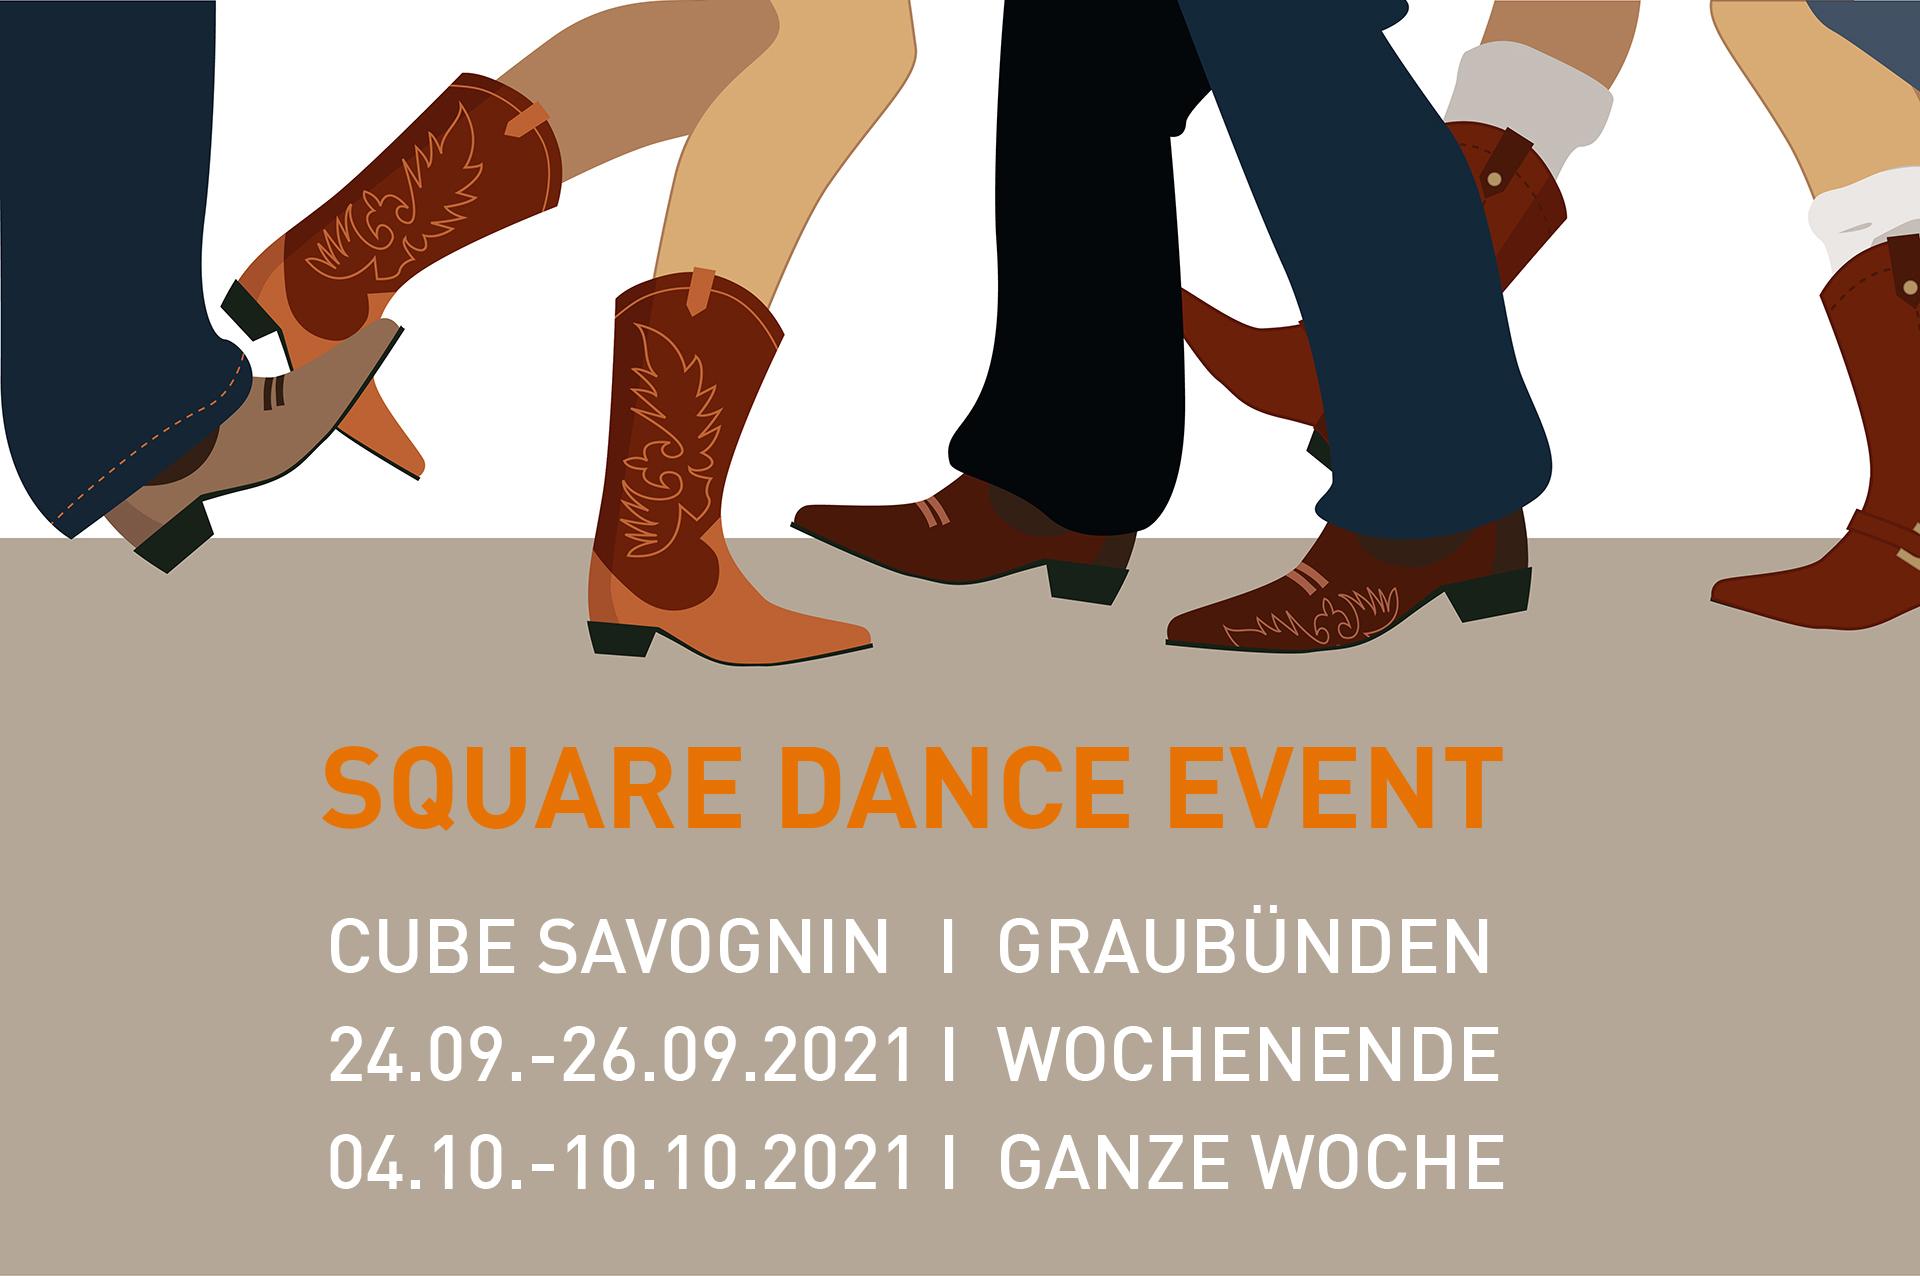 Square Dance Image mit Info web